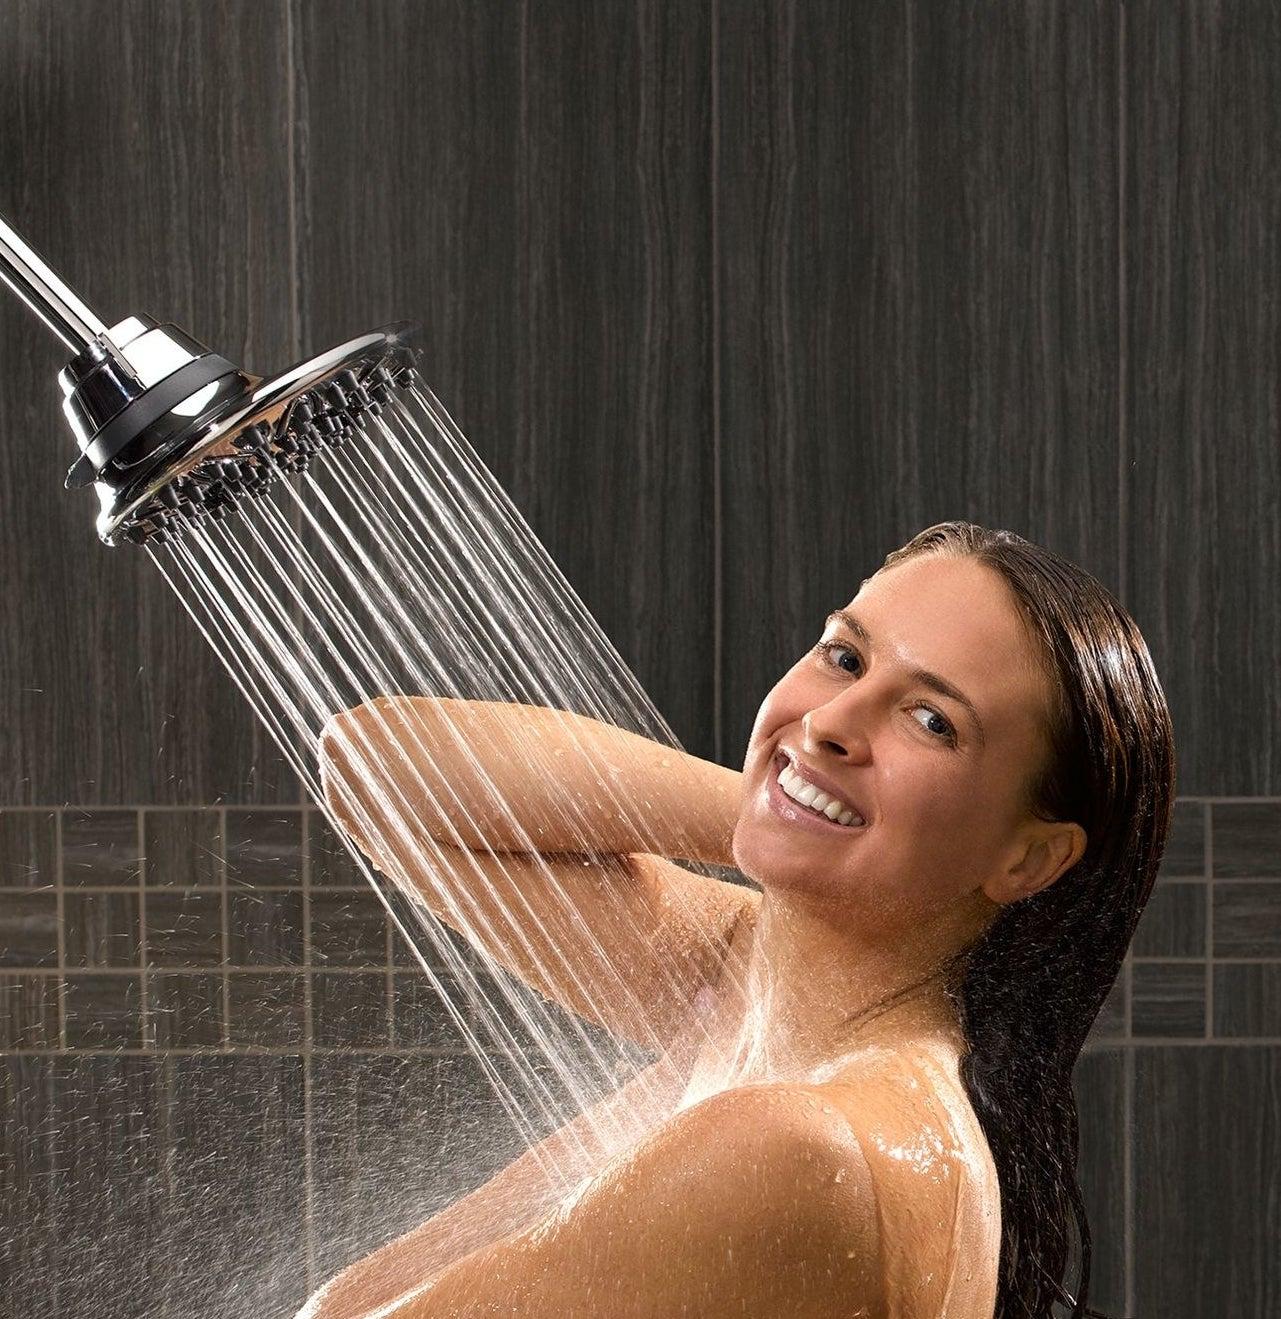 a model showers under the RainFall shower head